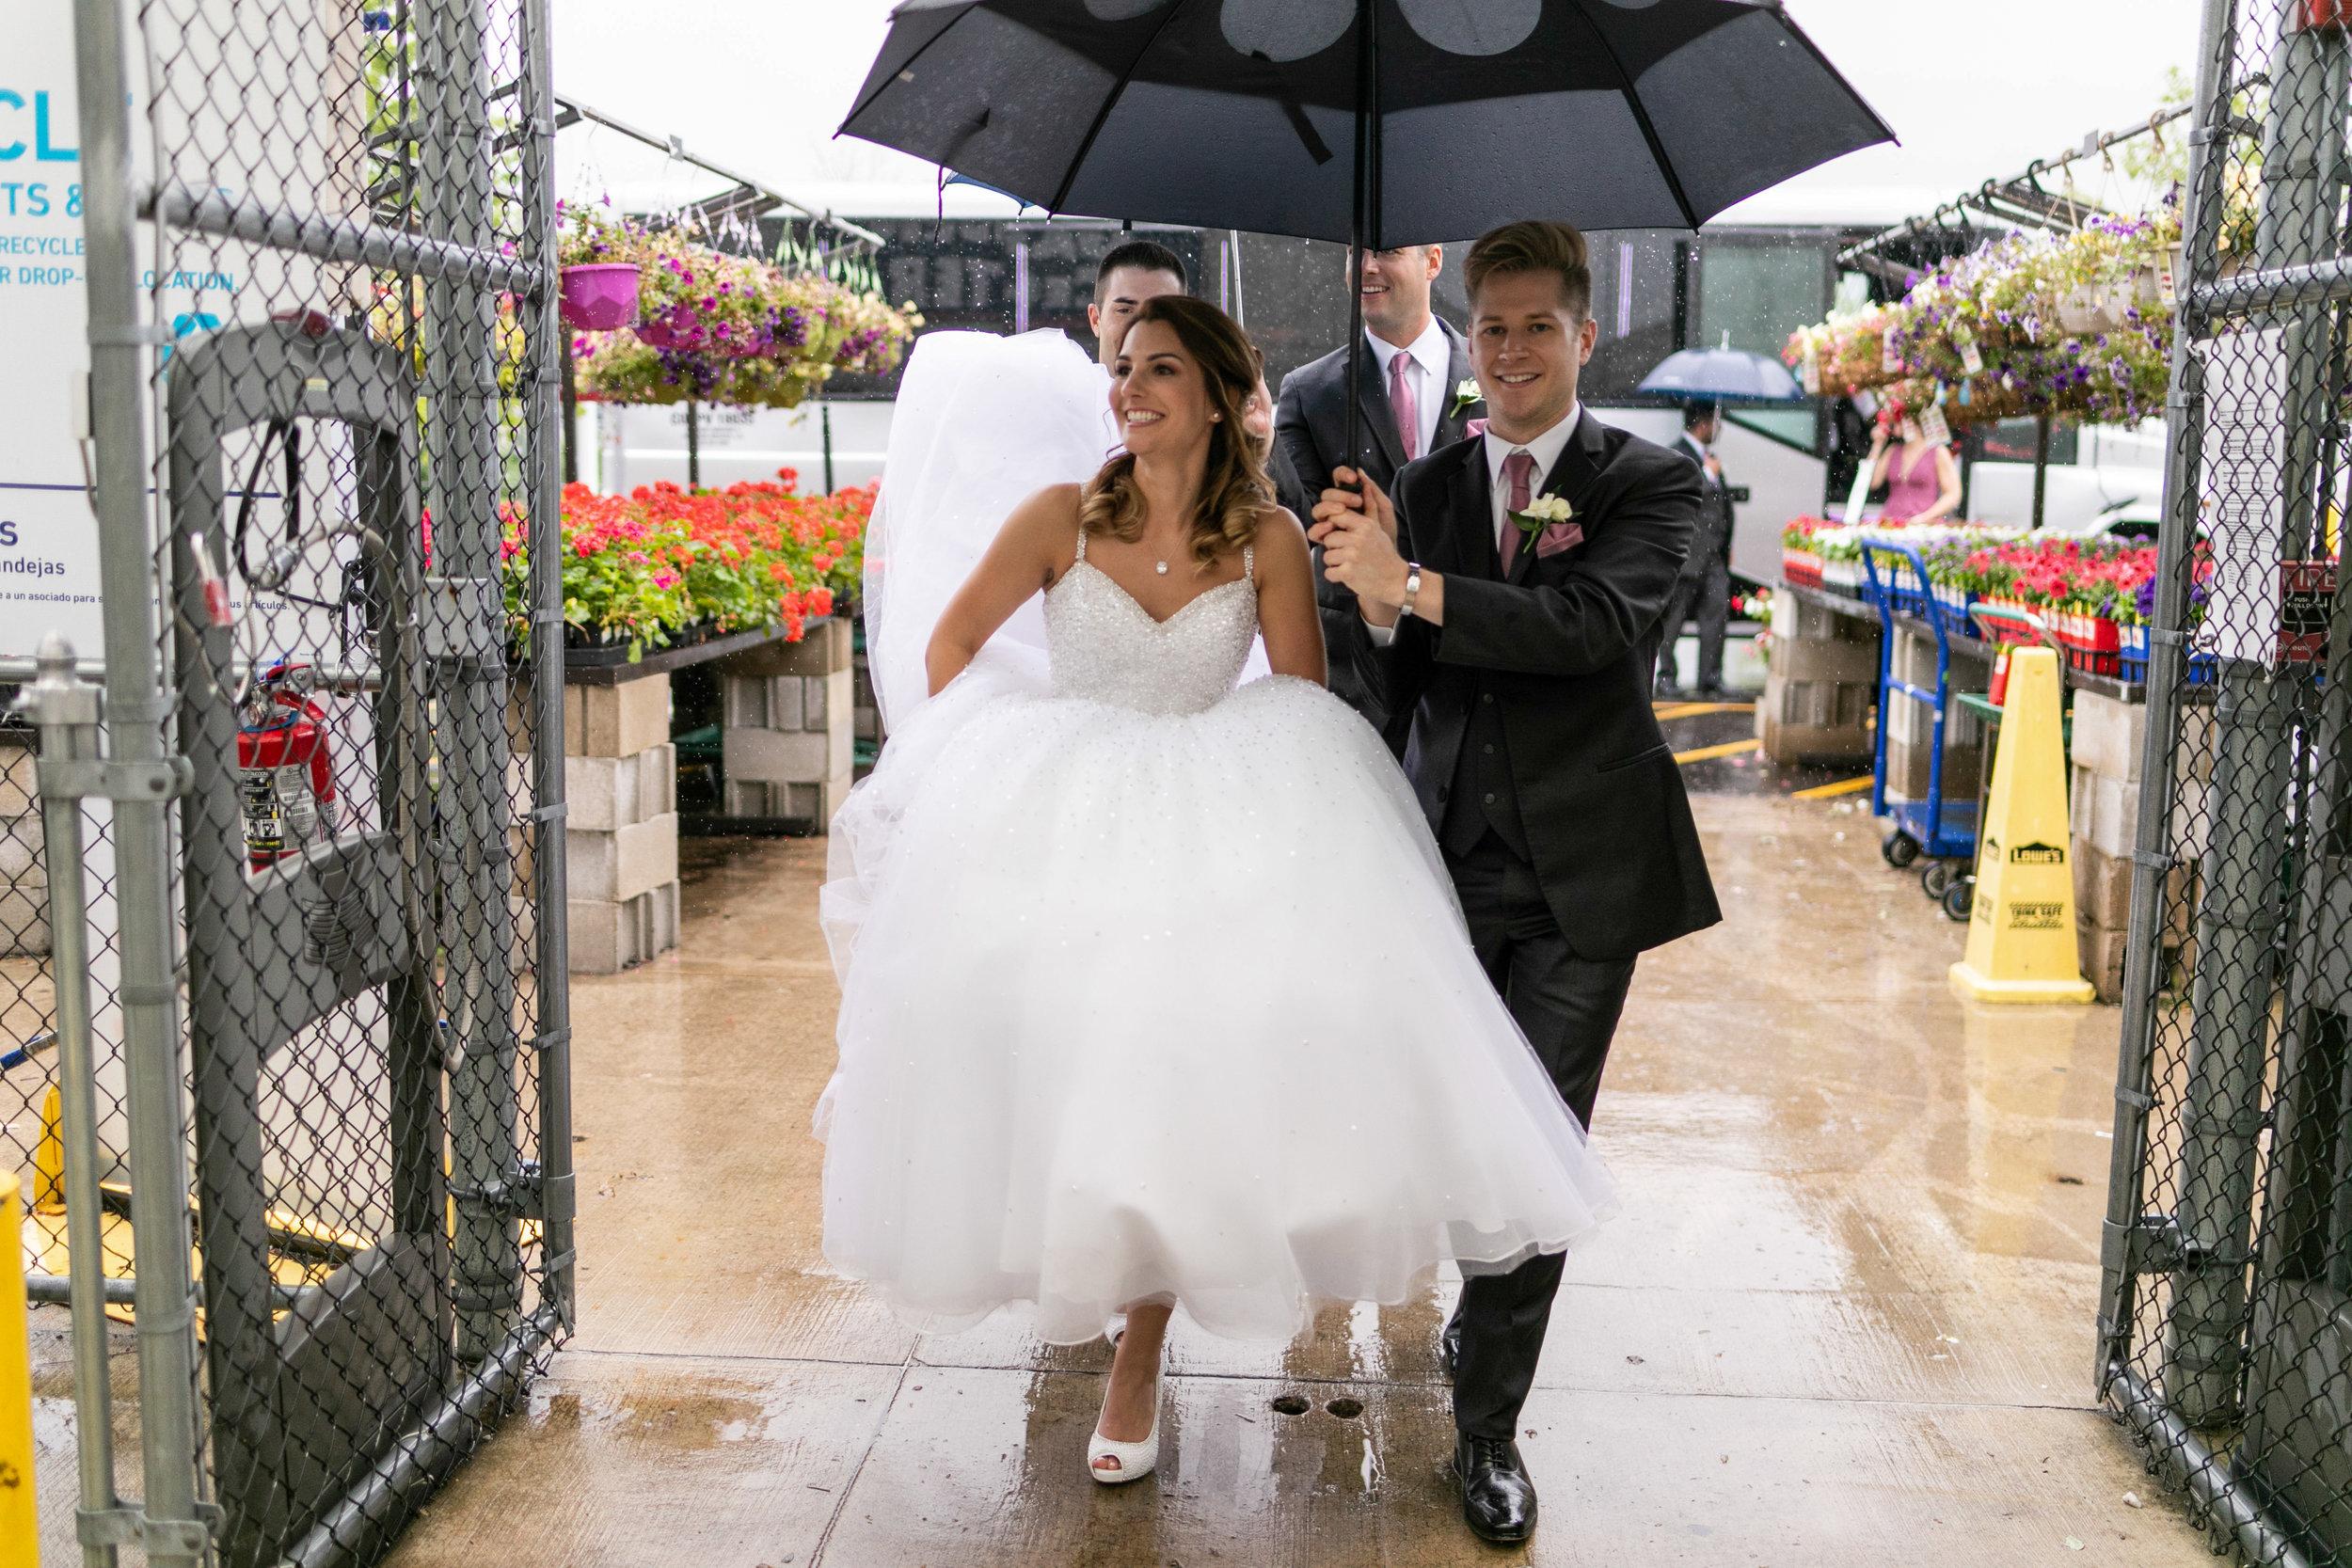 Wedding-couple-takes-photos-at-lowes-hardware-due-to-rain30.jpg